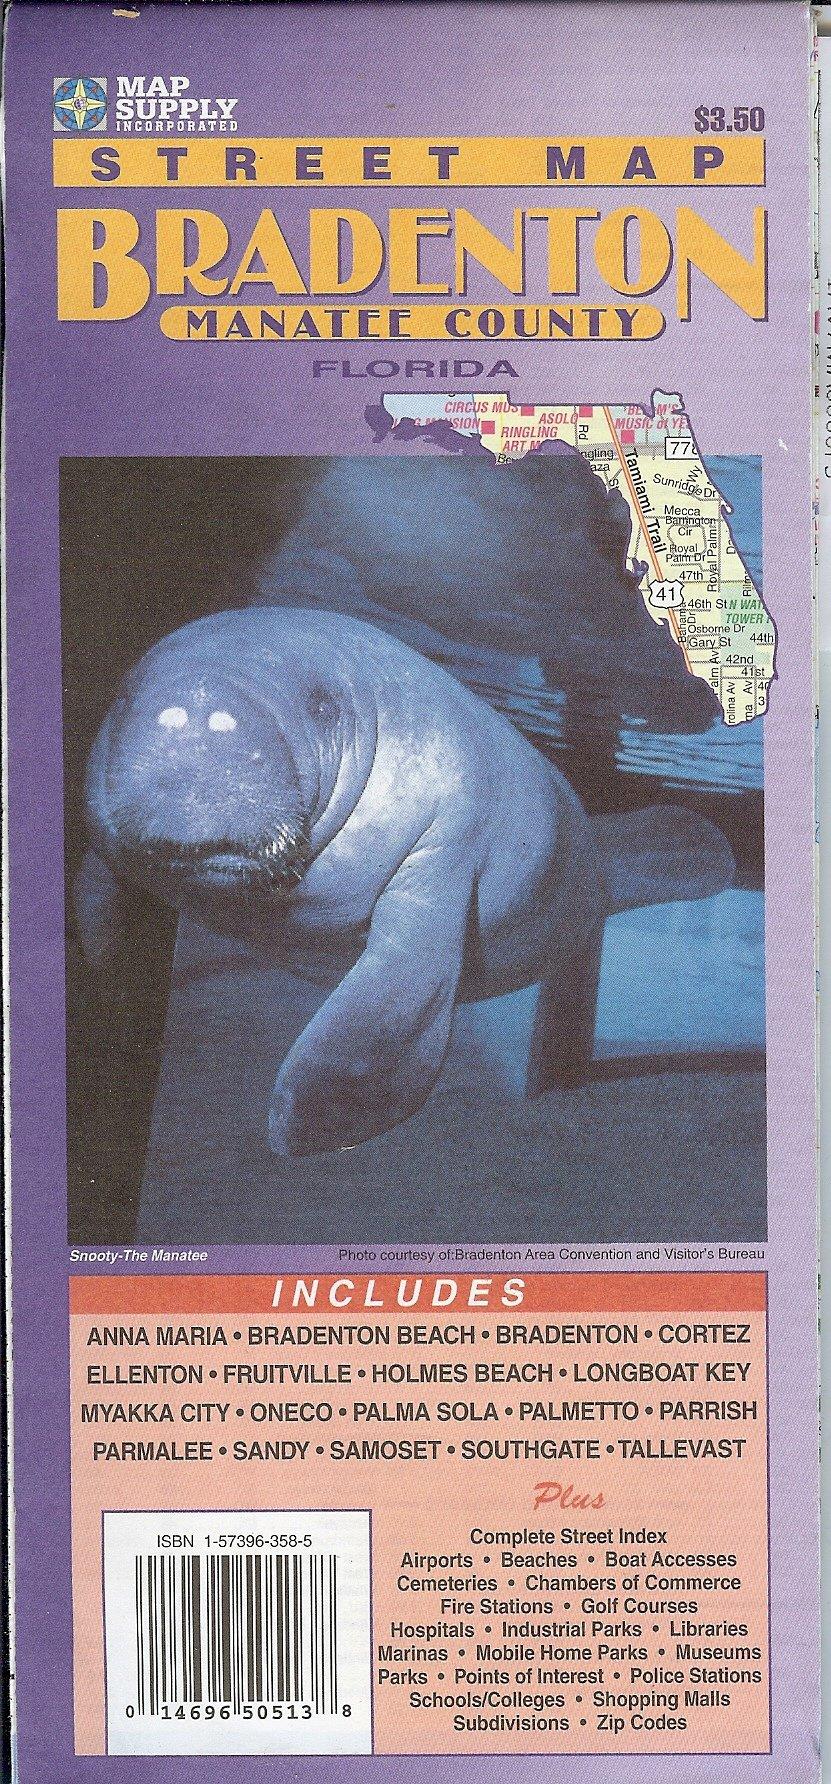 Street Map Bradenton Manatee County Florida Amazon Com Books